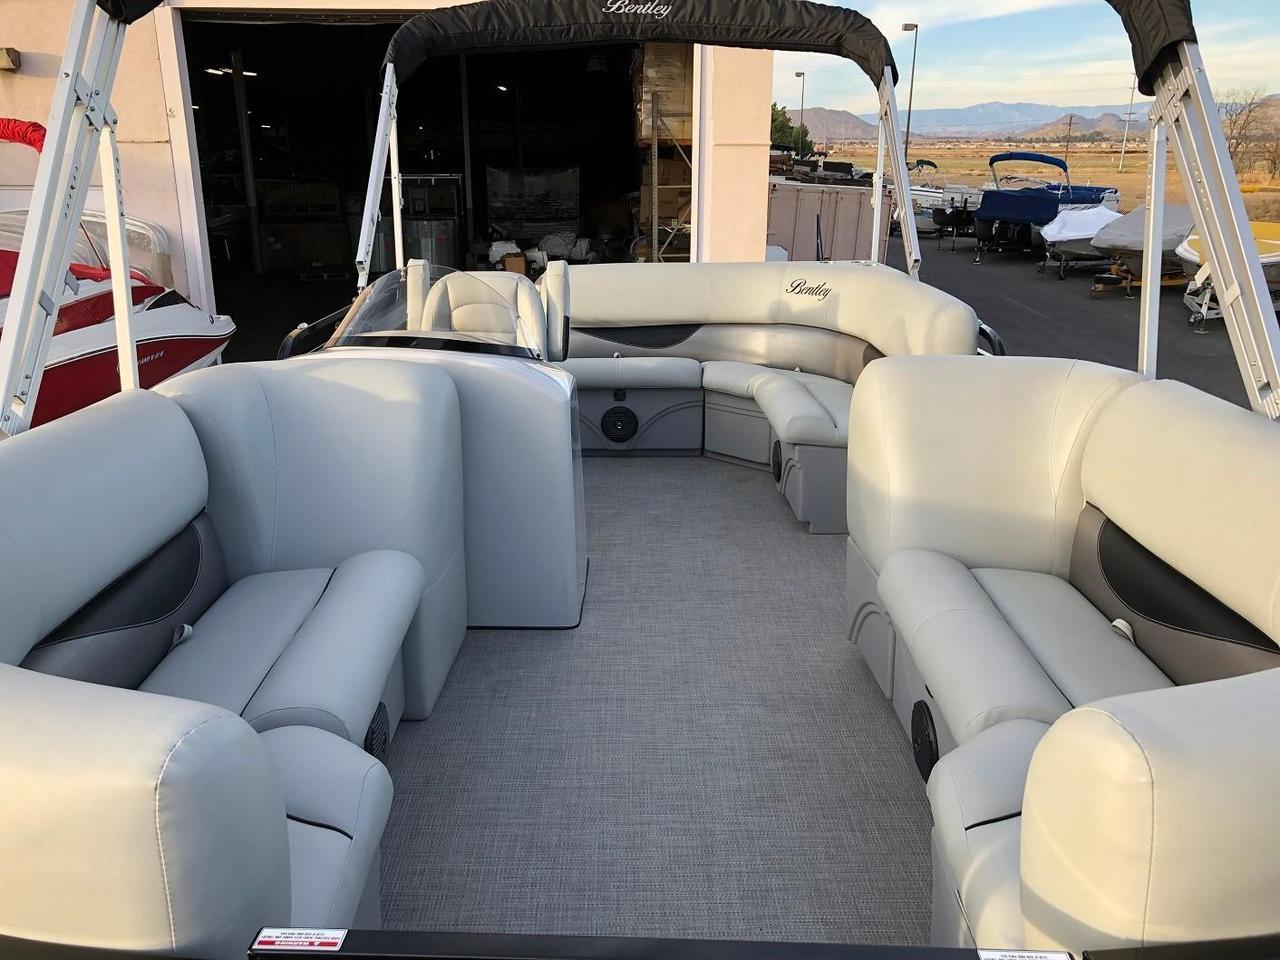 norfolk pontoon sale in rear boats bentley virginia for elite new lounger power pontoons va outboard